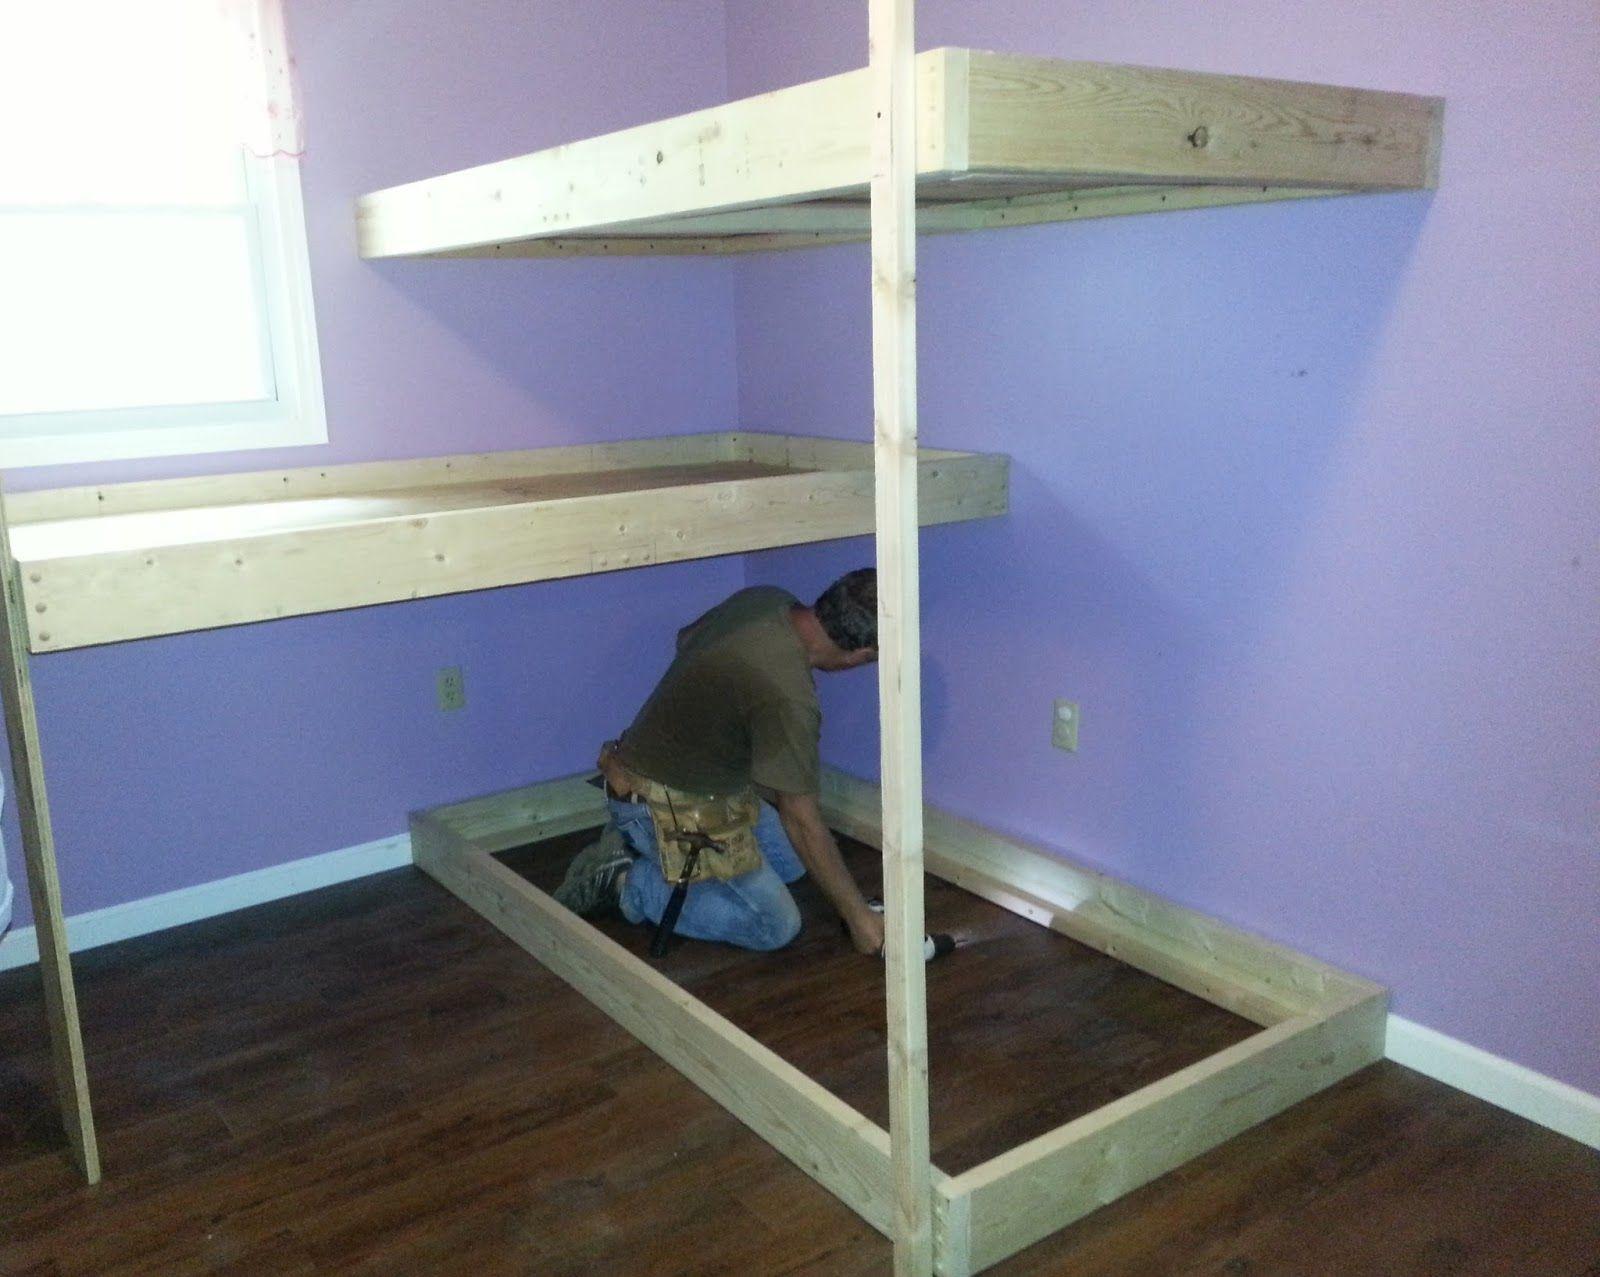 Diy kids loft bed plans  Diy instructions for a cool bunk bed  Kidus room  Pinterest  Bunk